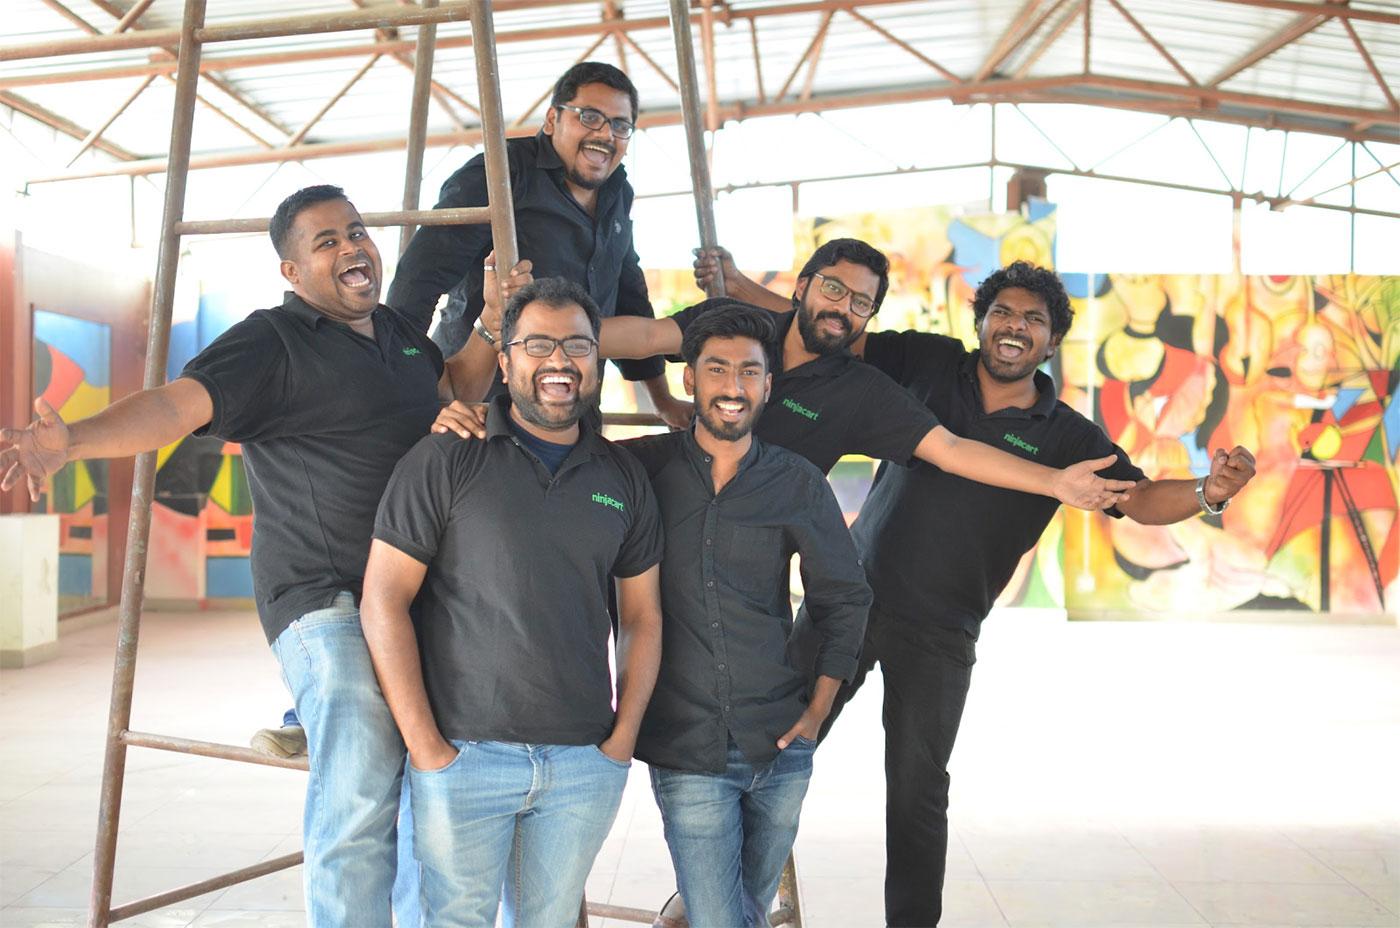 All Ninjacart Founders together   Thirukumaran Nagarajan, Vasudevan Chinnathambi, Ashutosh Vikram, Kartheeswaran KK, Sharath Babu Loganathan